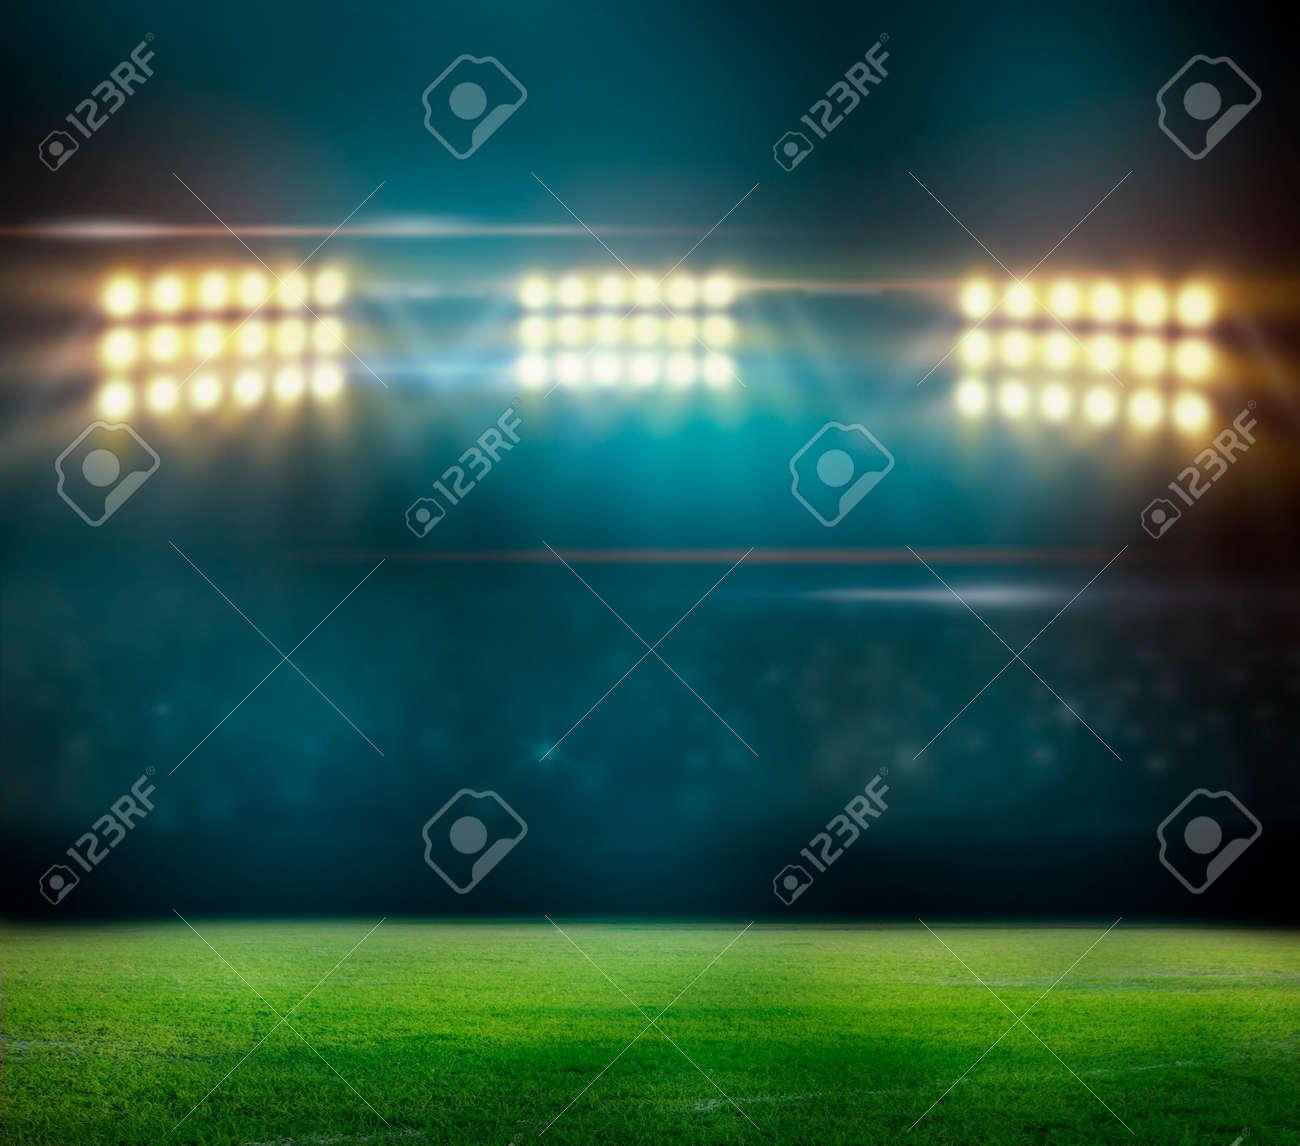 Green soccer field, - 29776648